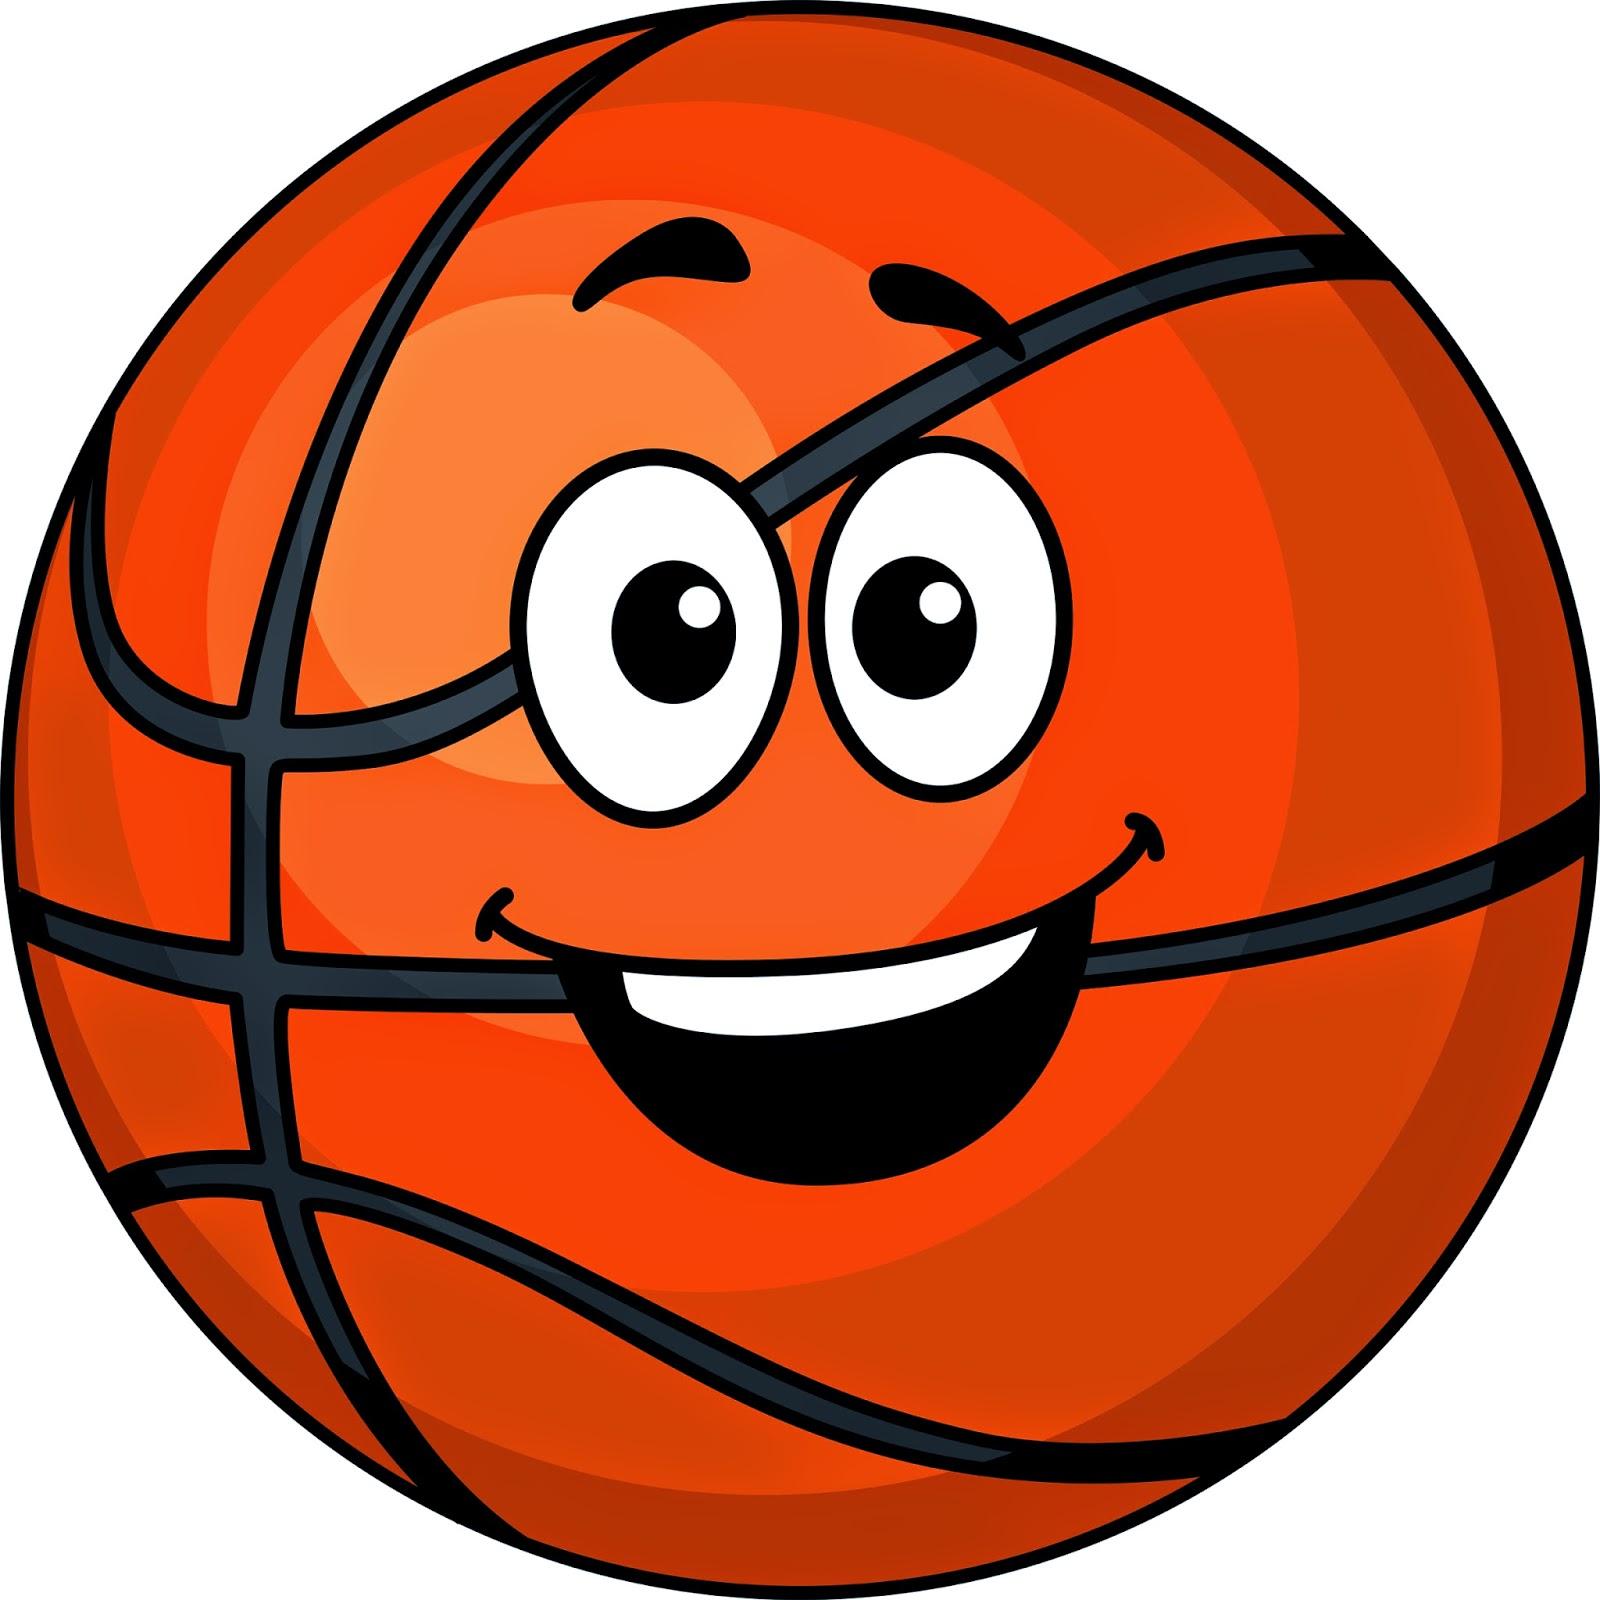 how to make big head signs at basketball games